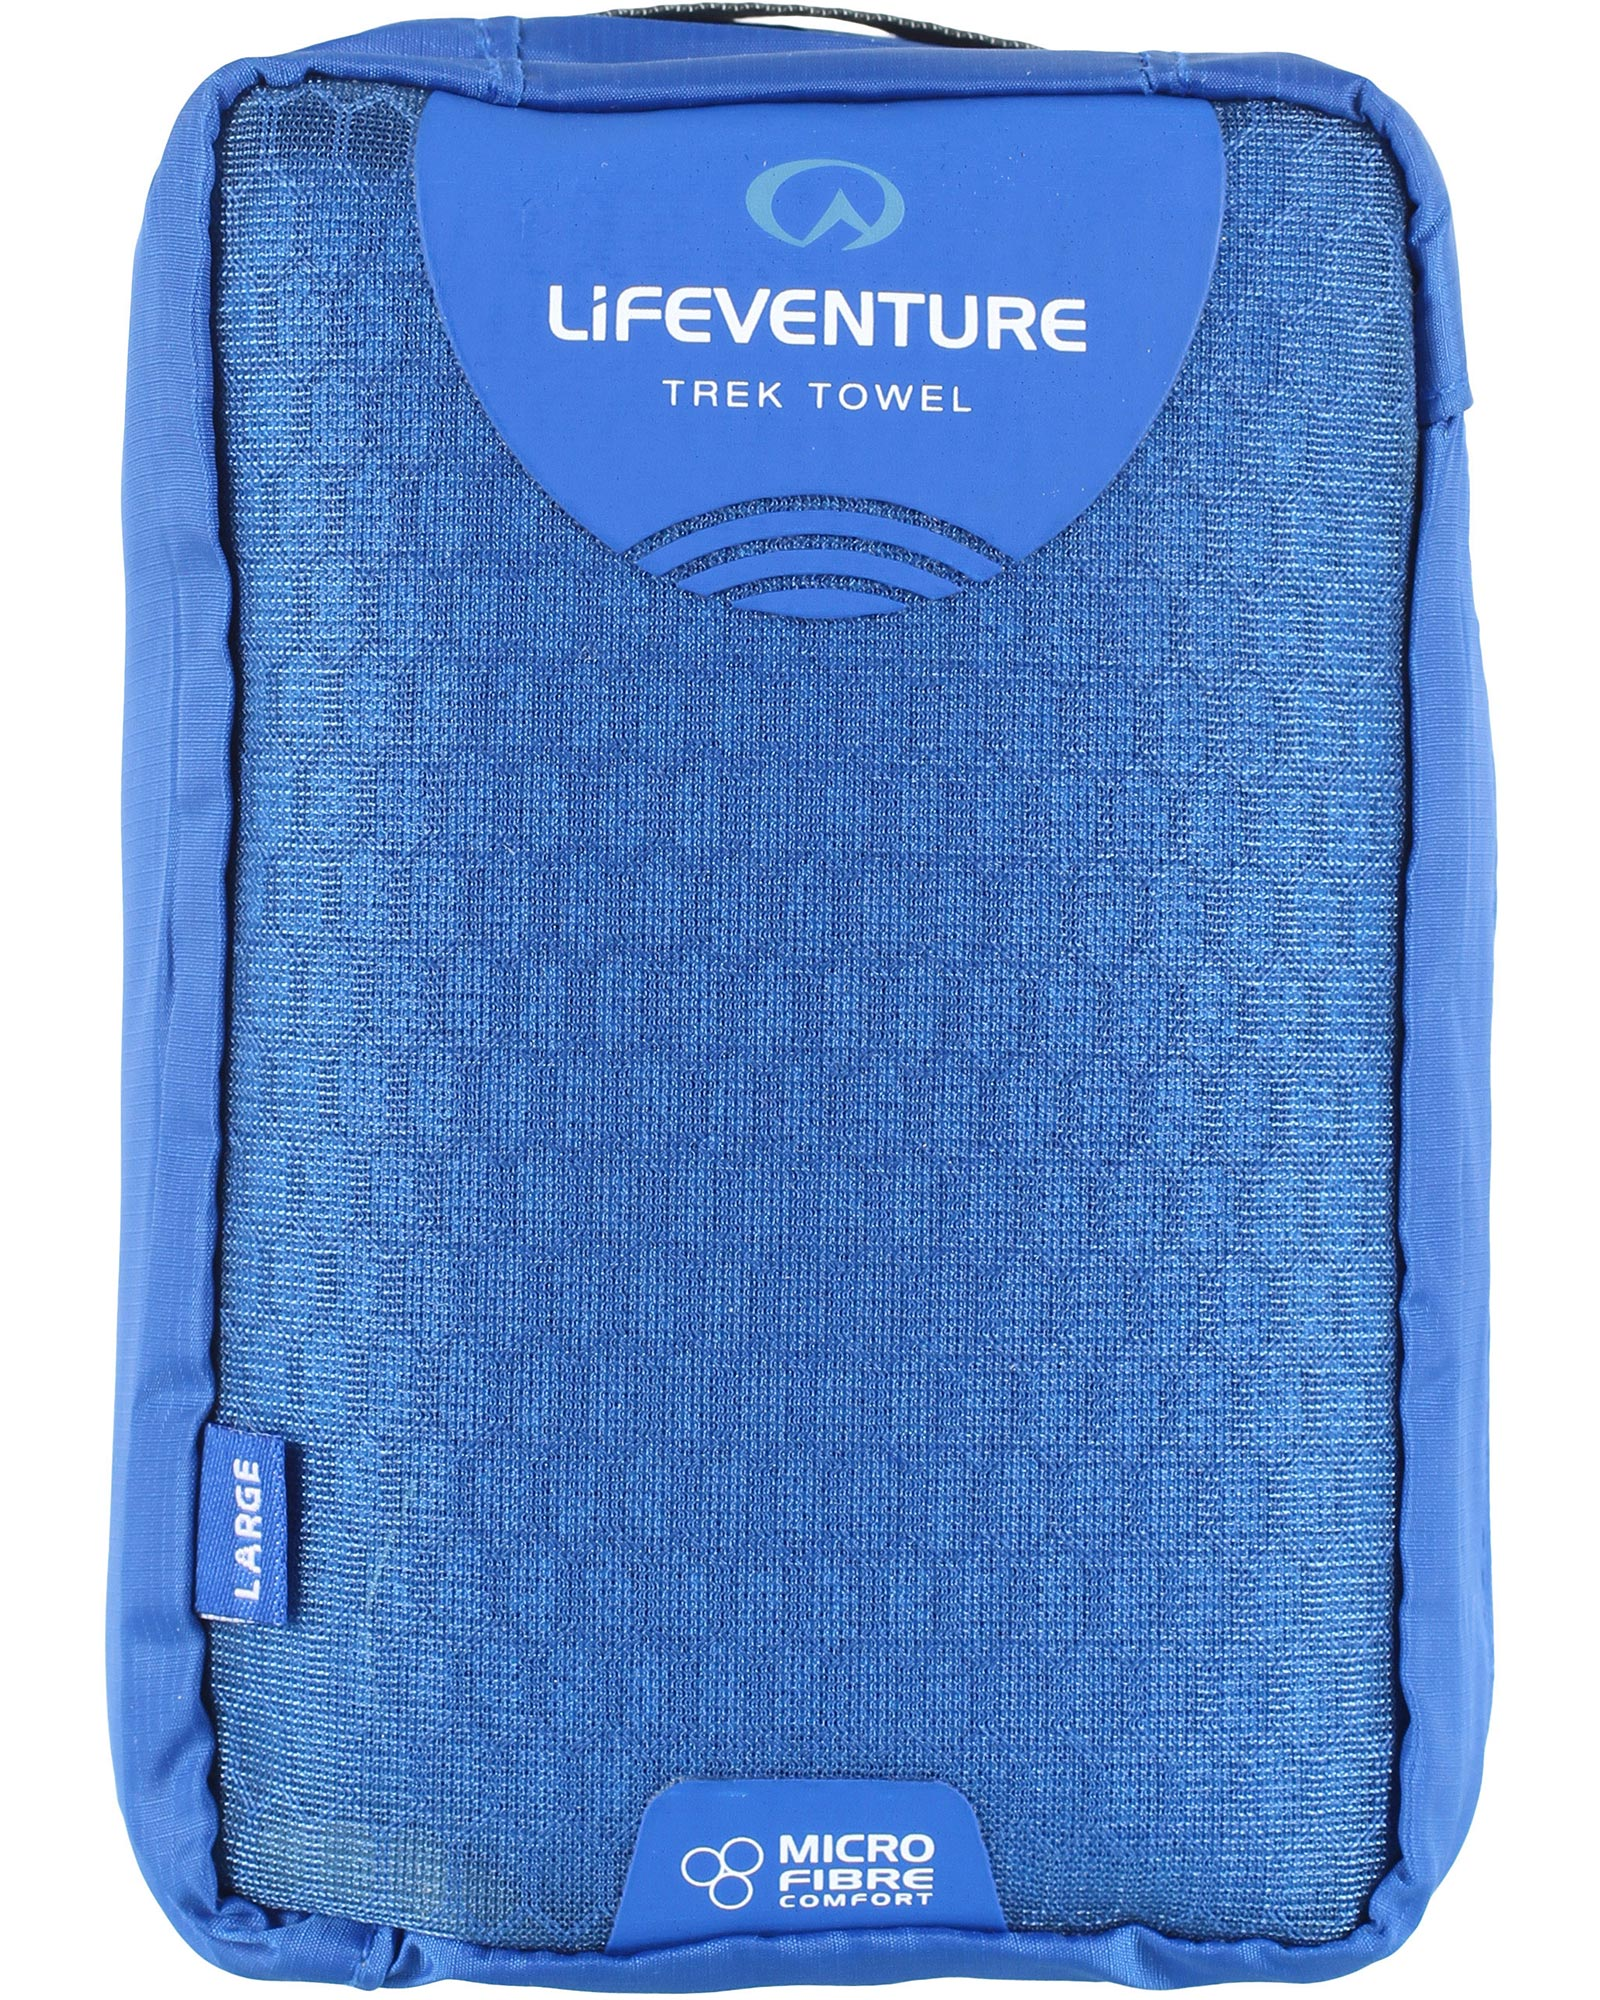 Product image of Lifeventure MicroFibre Trek Towel - Large